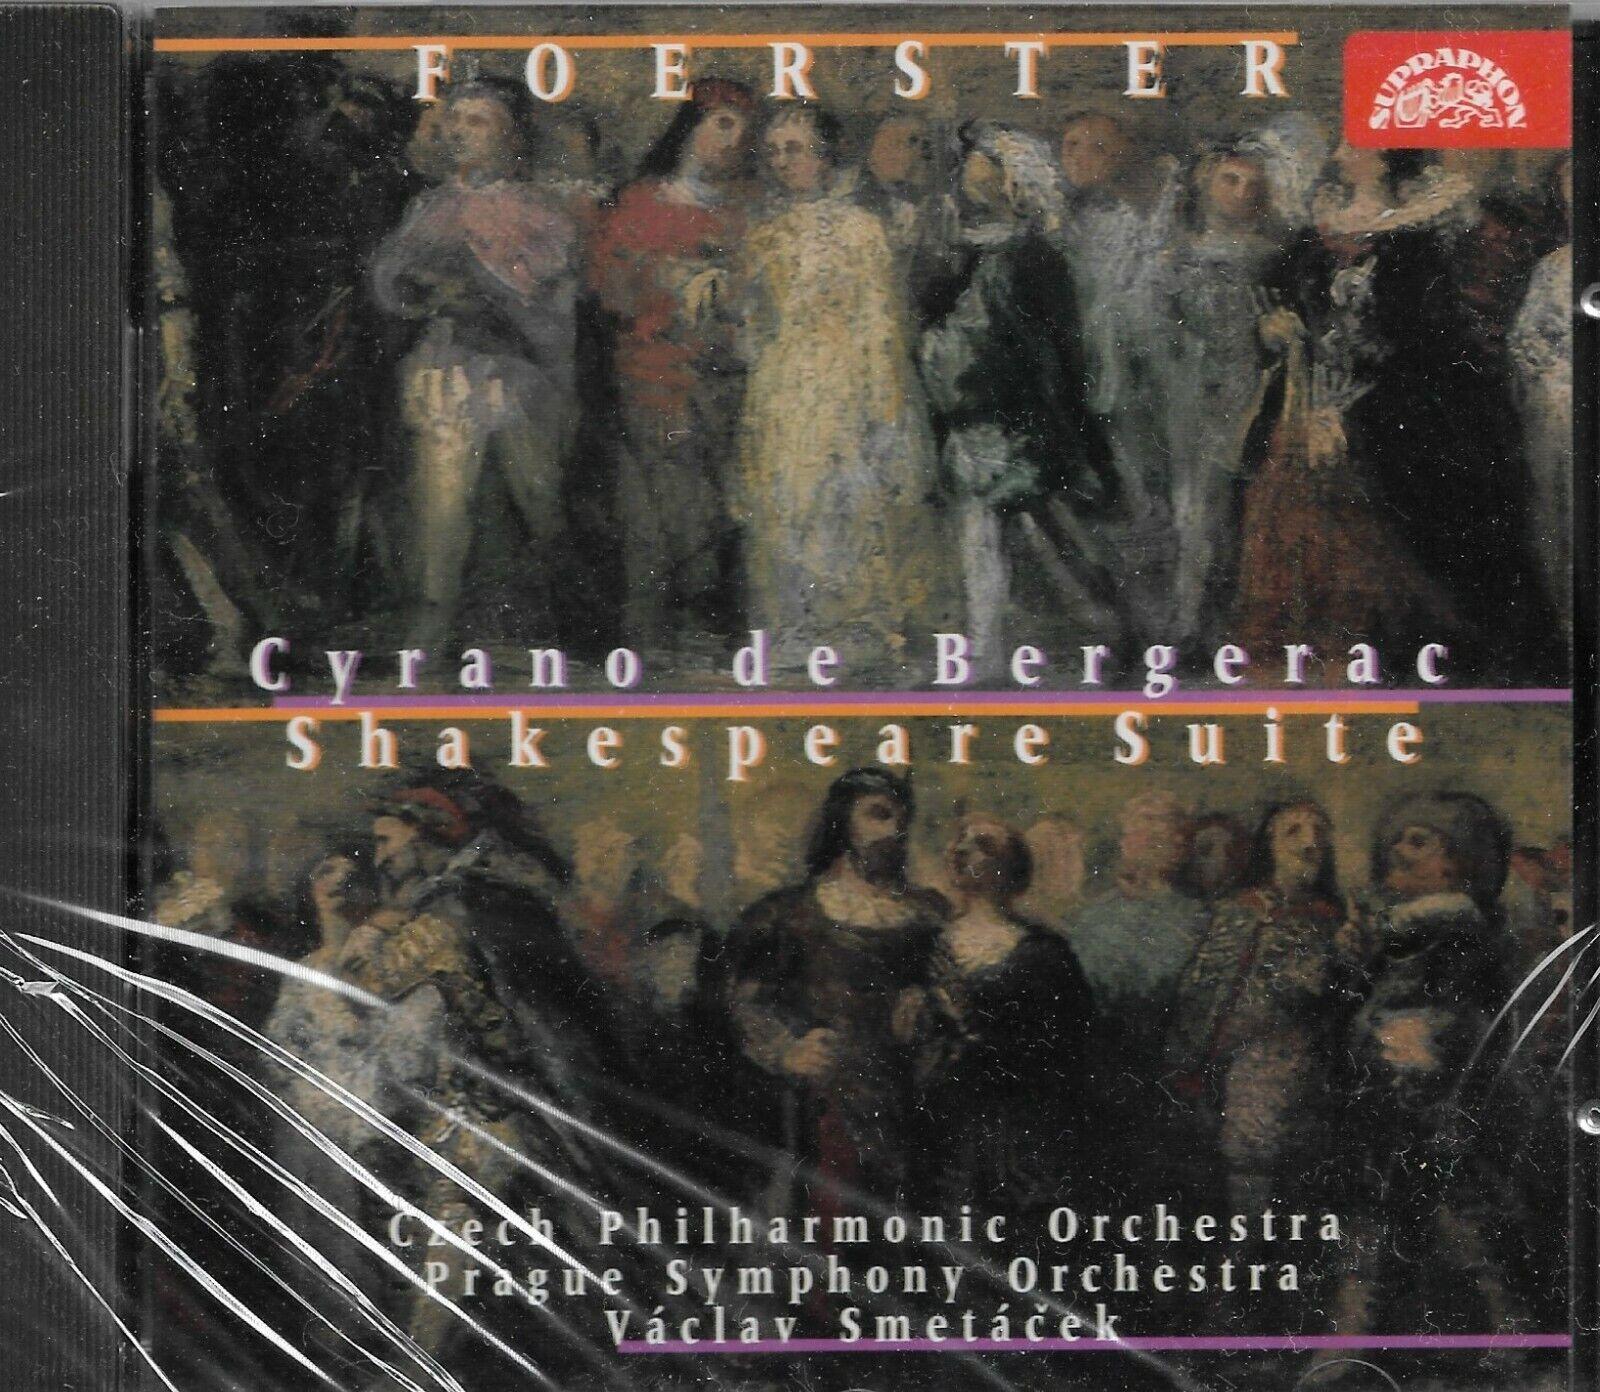 Foerster: Cyrano De Bergerac/Shakespeare Suite (CD, Sep-1996, Supraphon)  for sale online   eBay